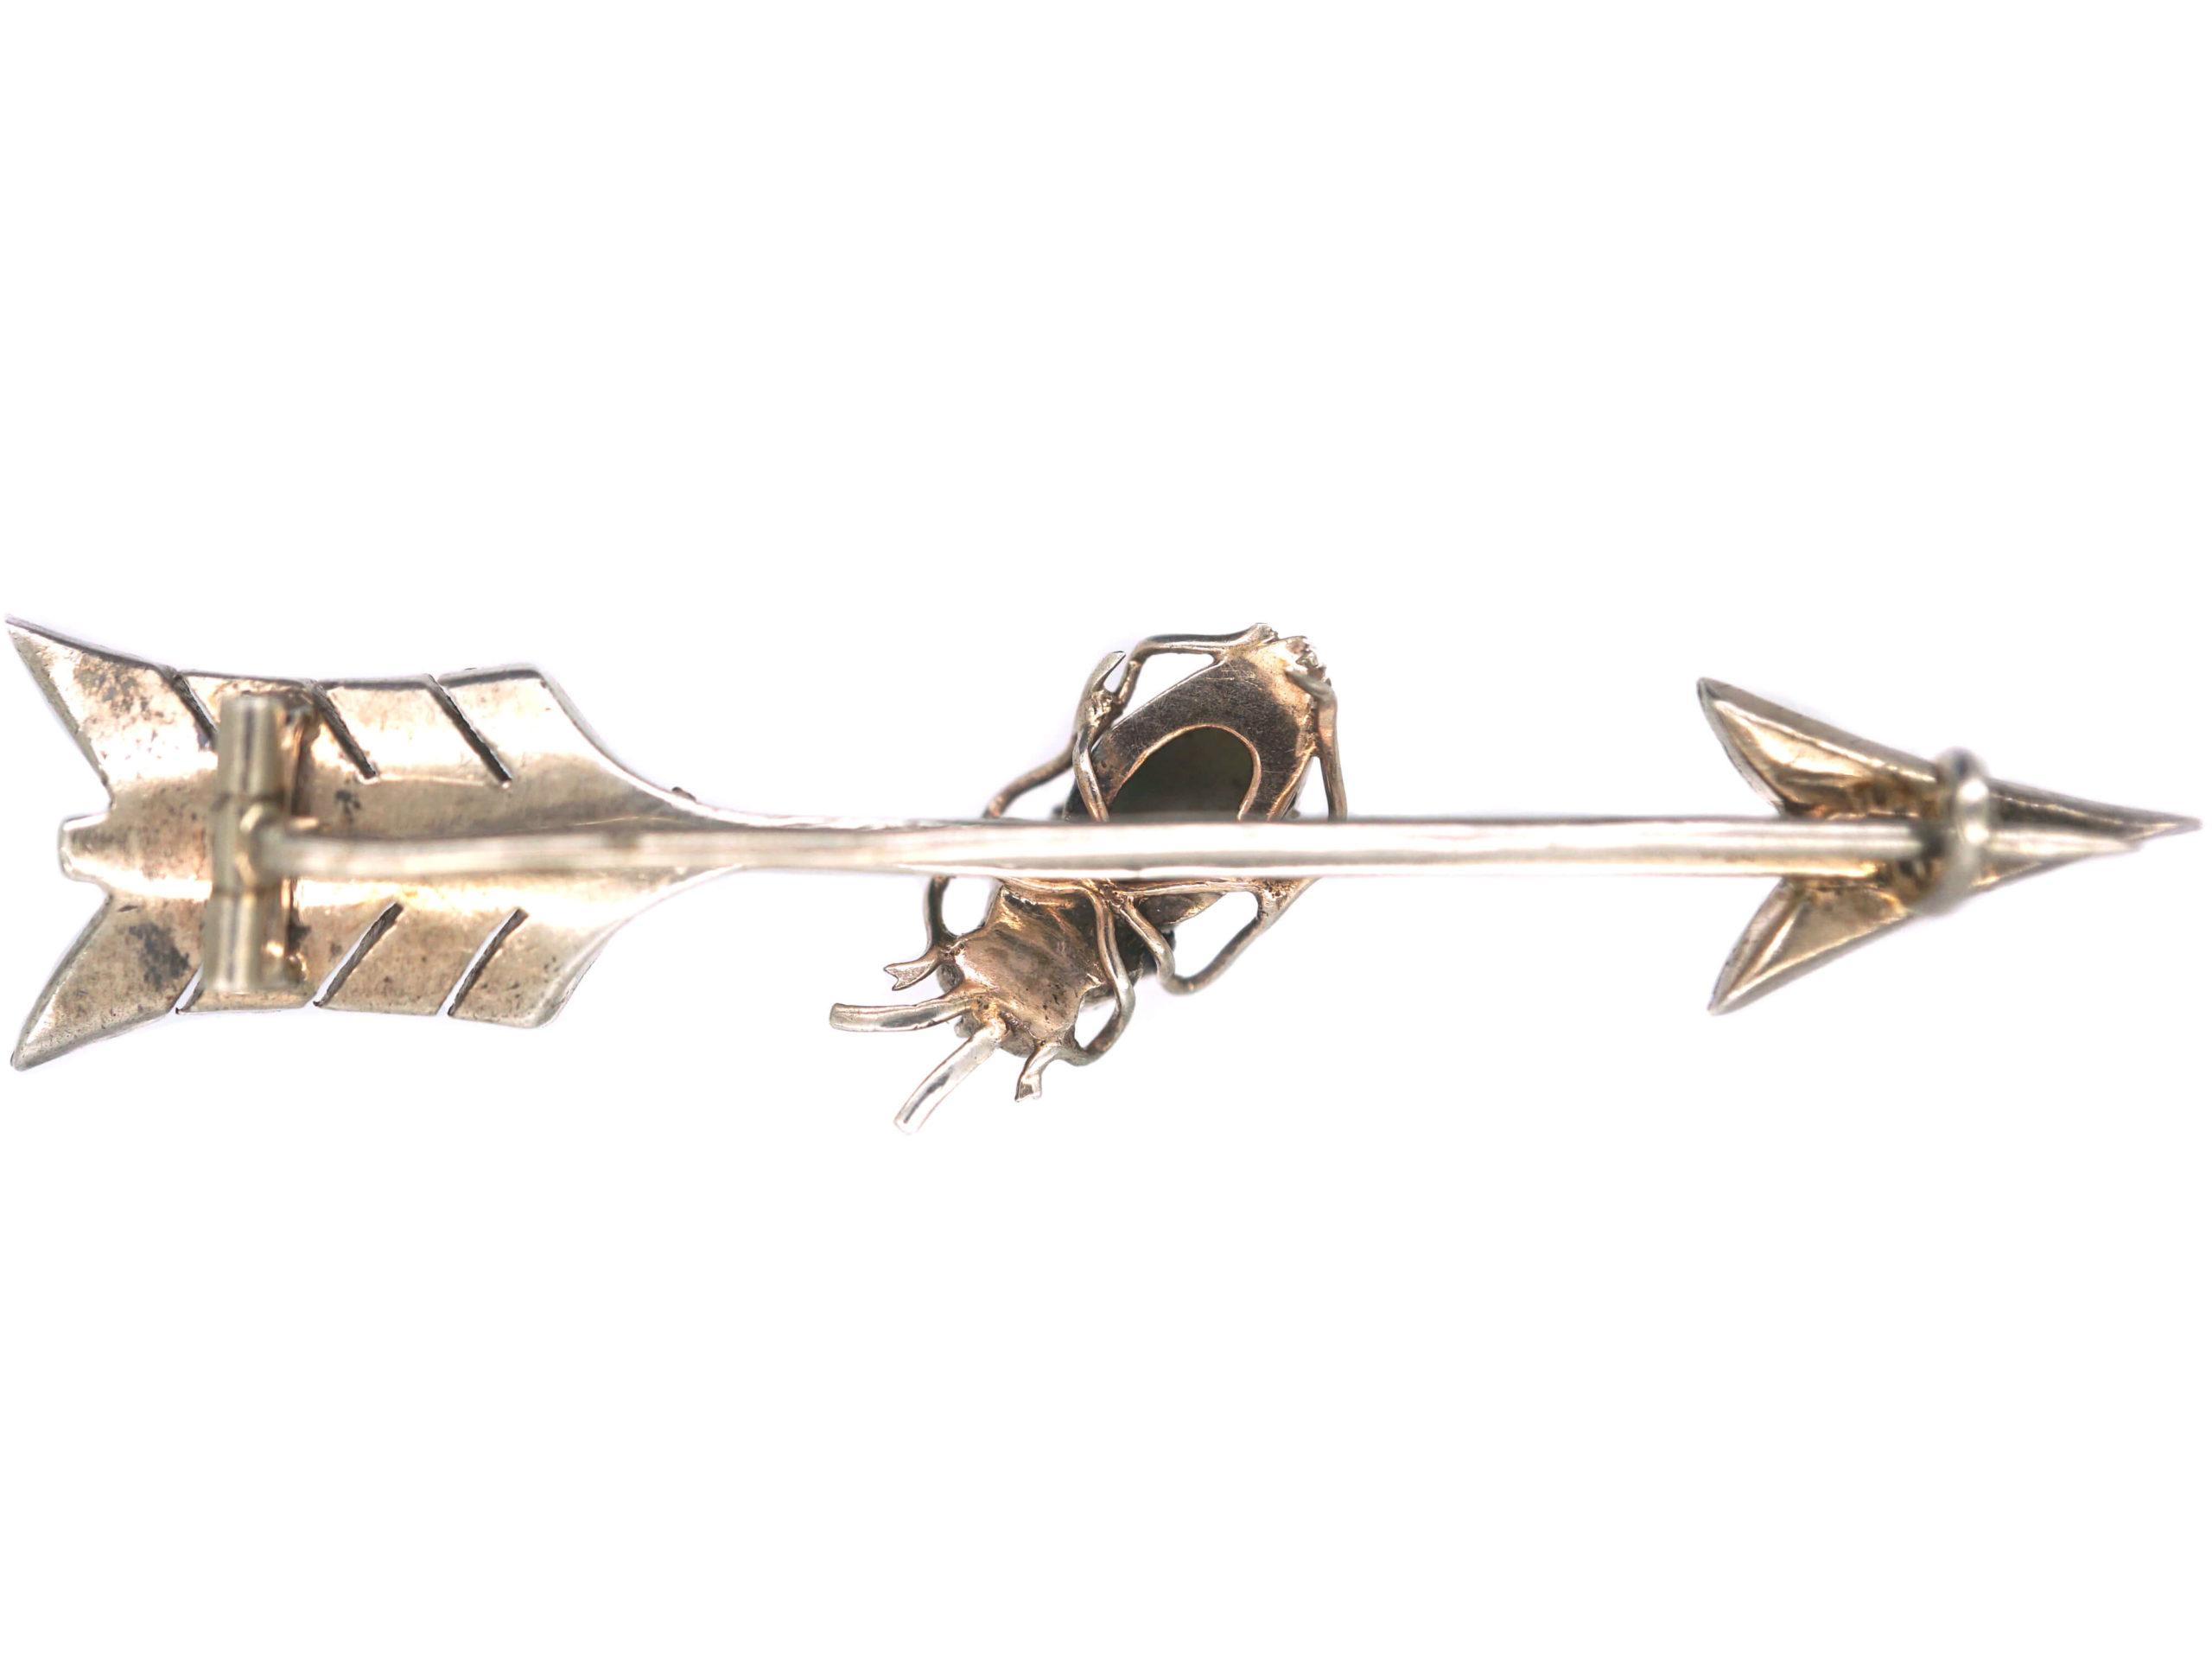 Victorian Silver & Natural Split Pearl Arrow Brooch with Cat's Eye Chrysoberyl Bug